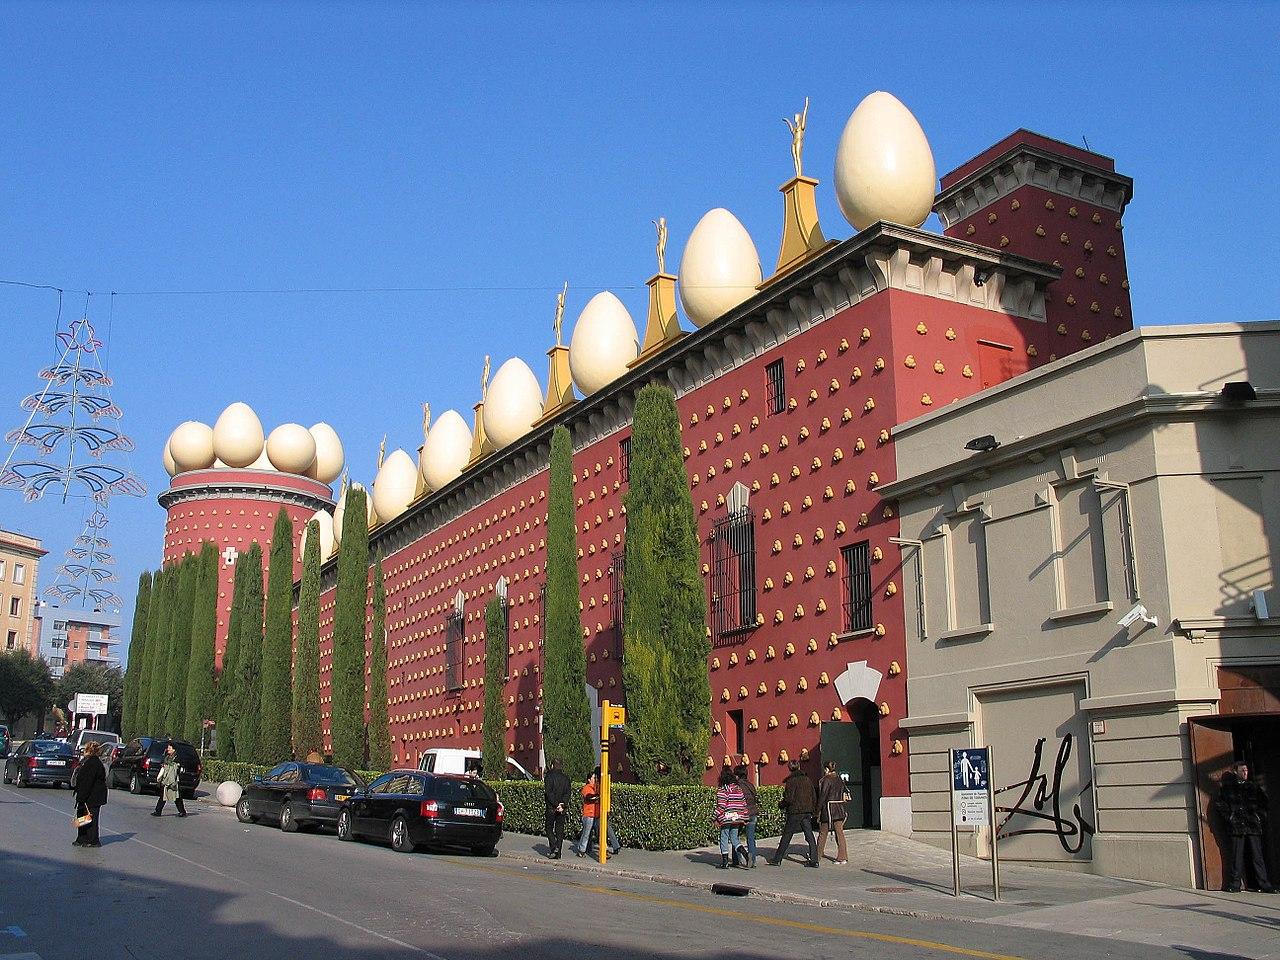 Exterior del Teatro-Museo Dalí, en Figueres (Girona).